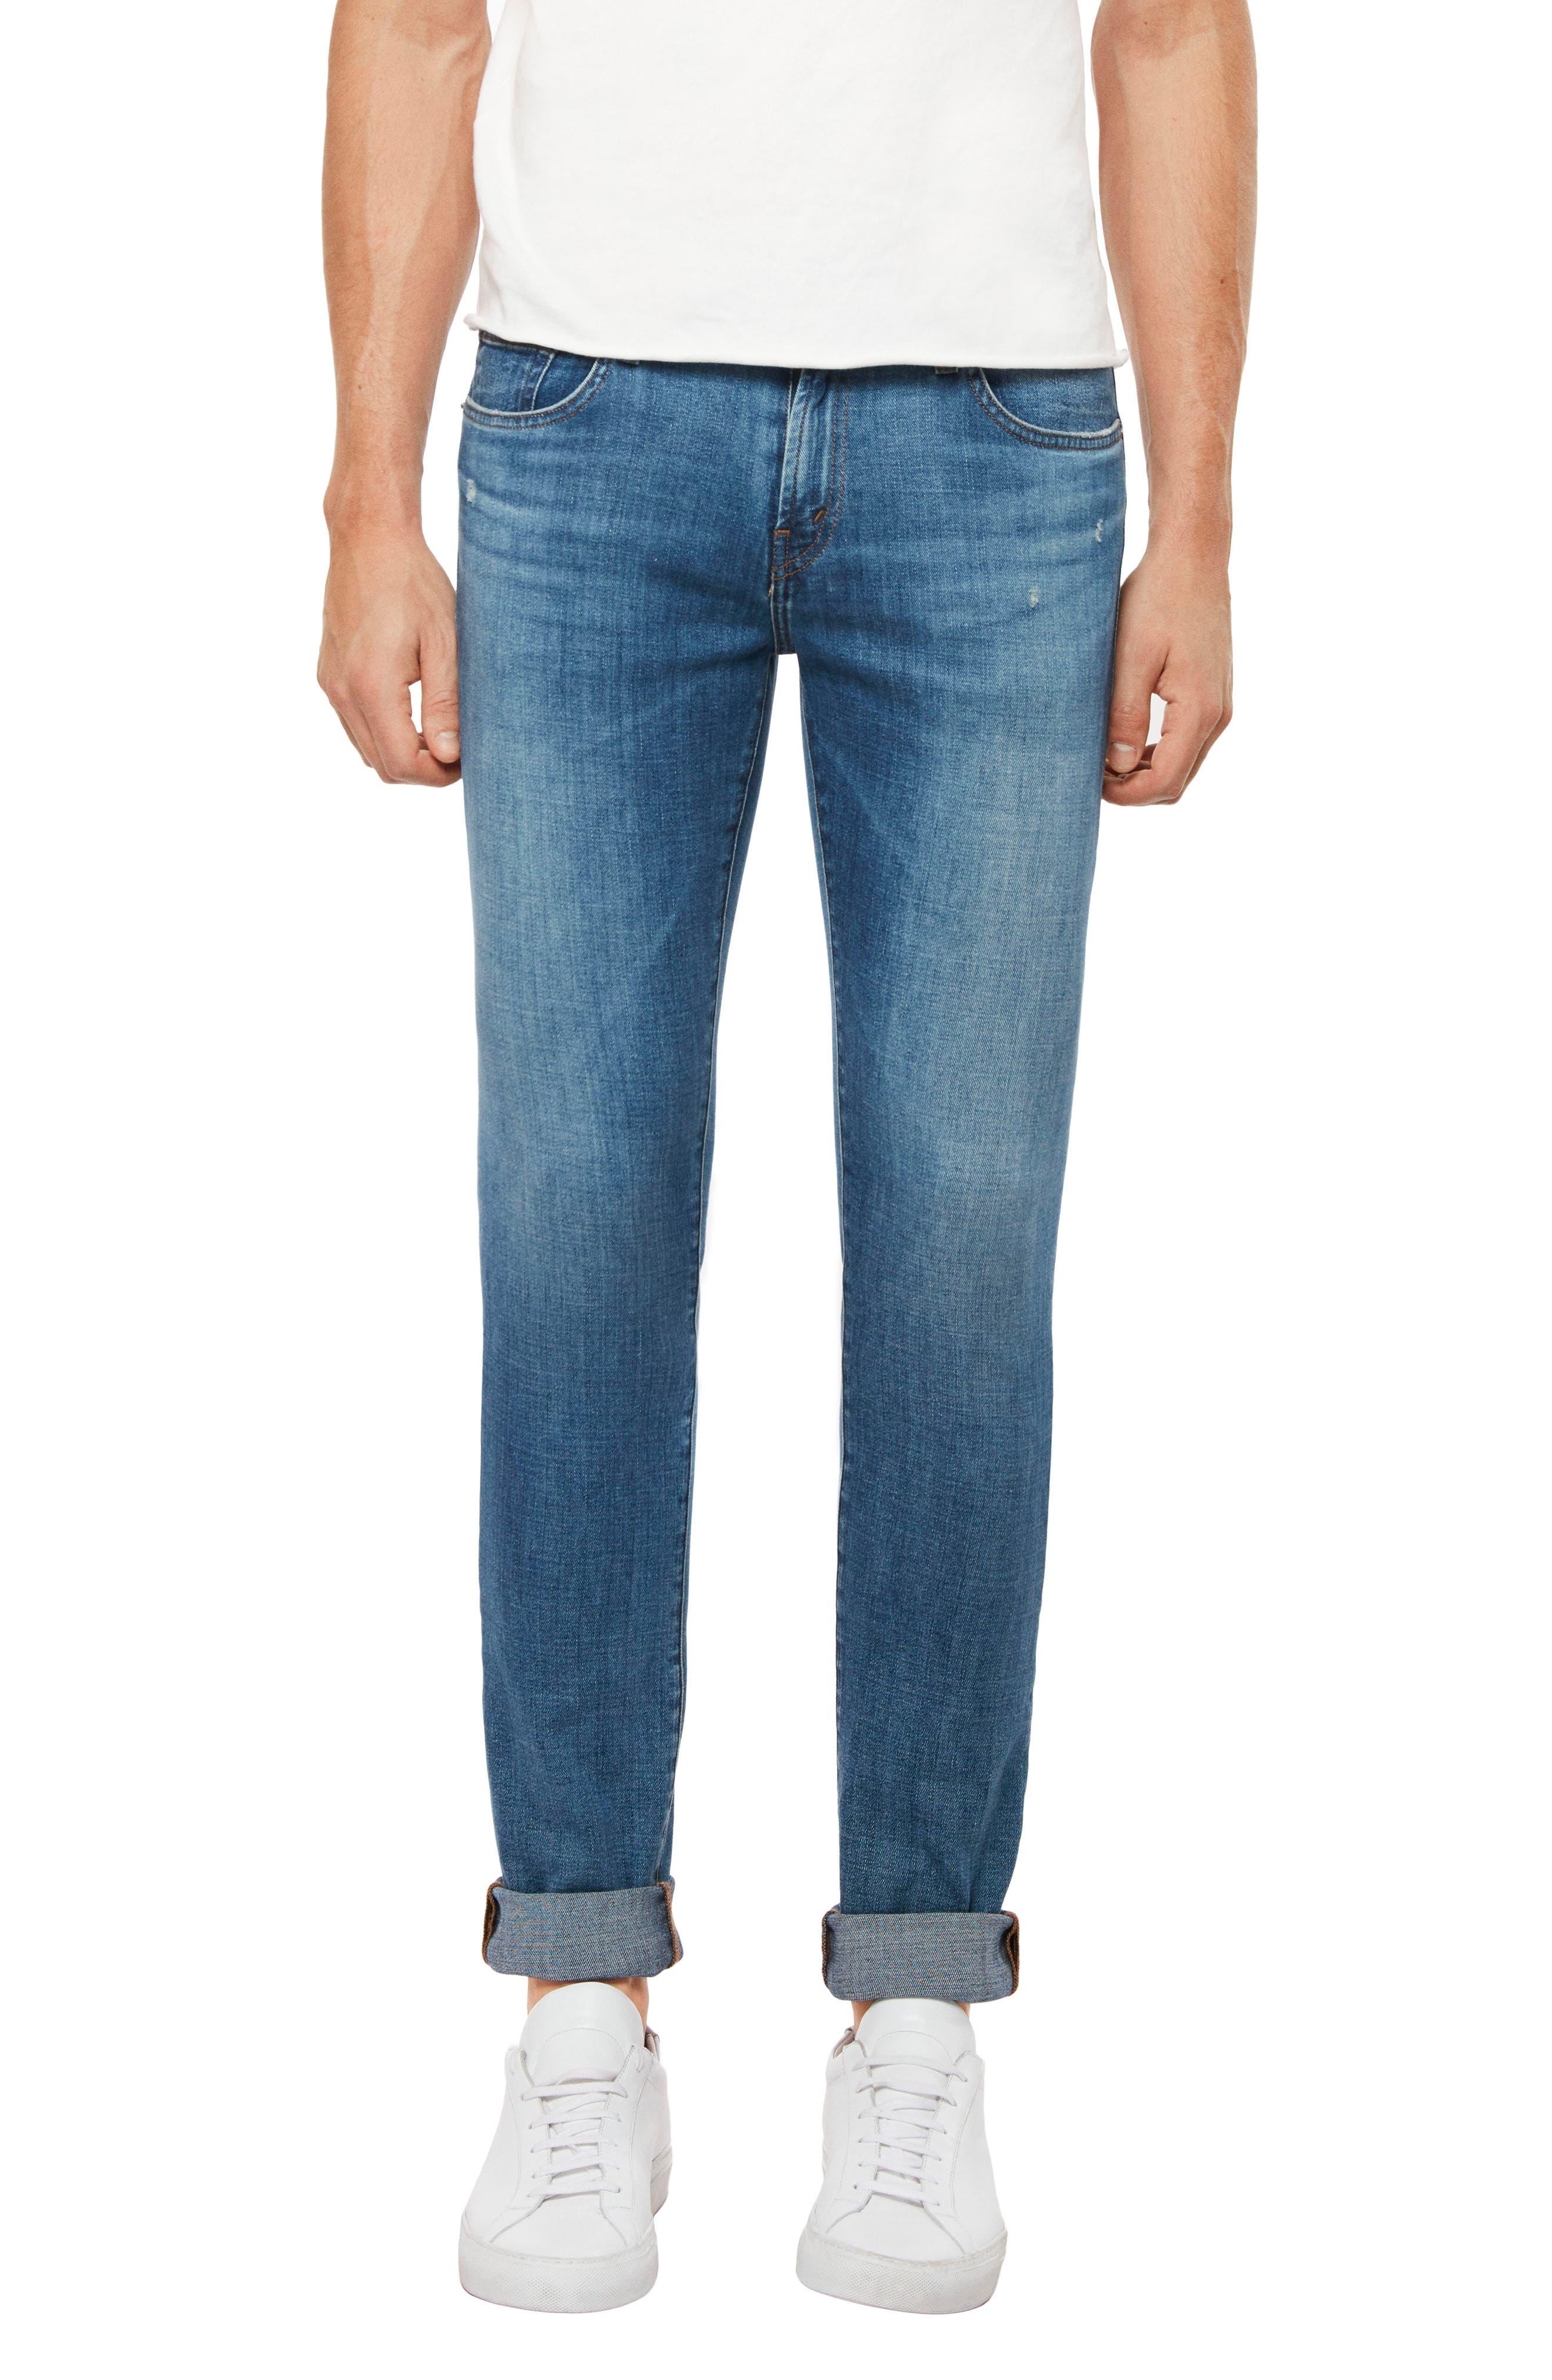 Tyler Slim Fit Jeans,                         Main,                         color, Sinter